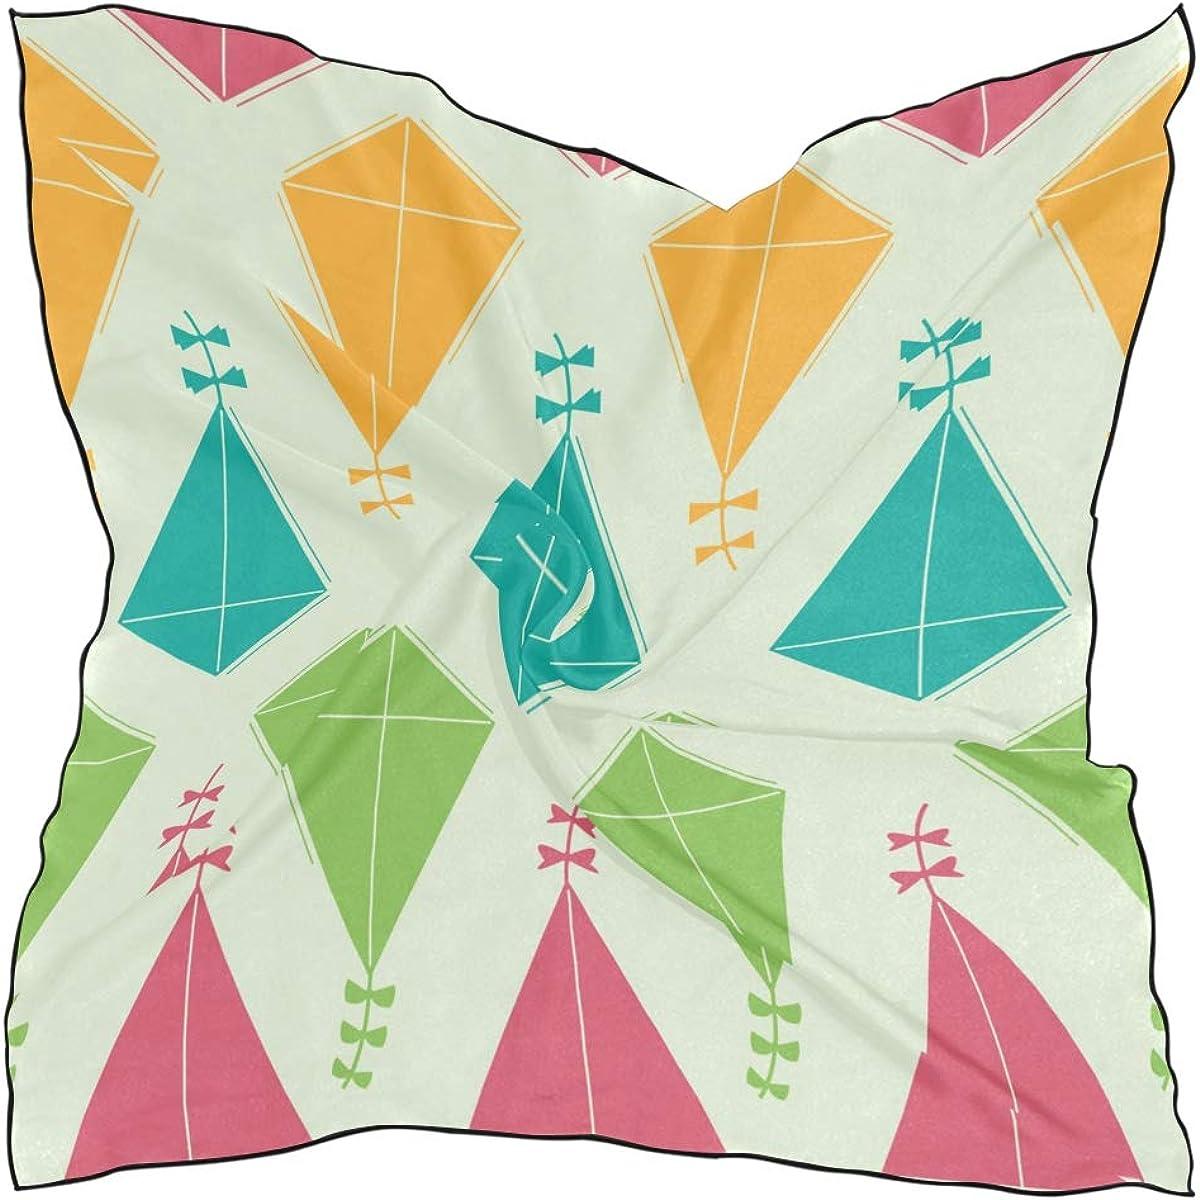 Women's Soft Polyester Silk Square Scarf Kite Game Toy Play Spring Children Fashion Print Head & Hair Scarf Neckerchief Accessory-23.6x23.6 Inch